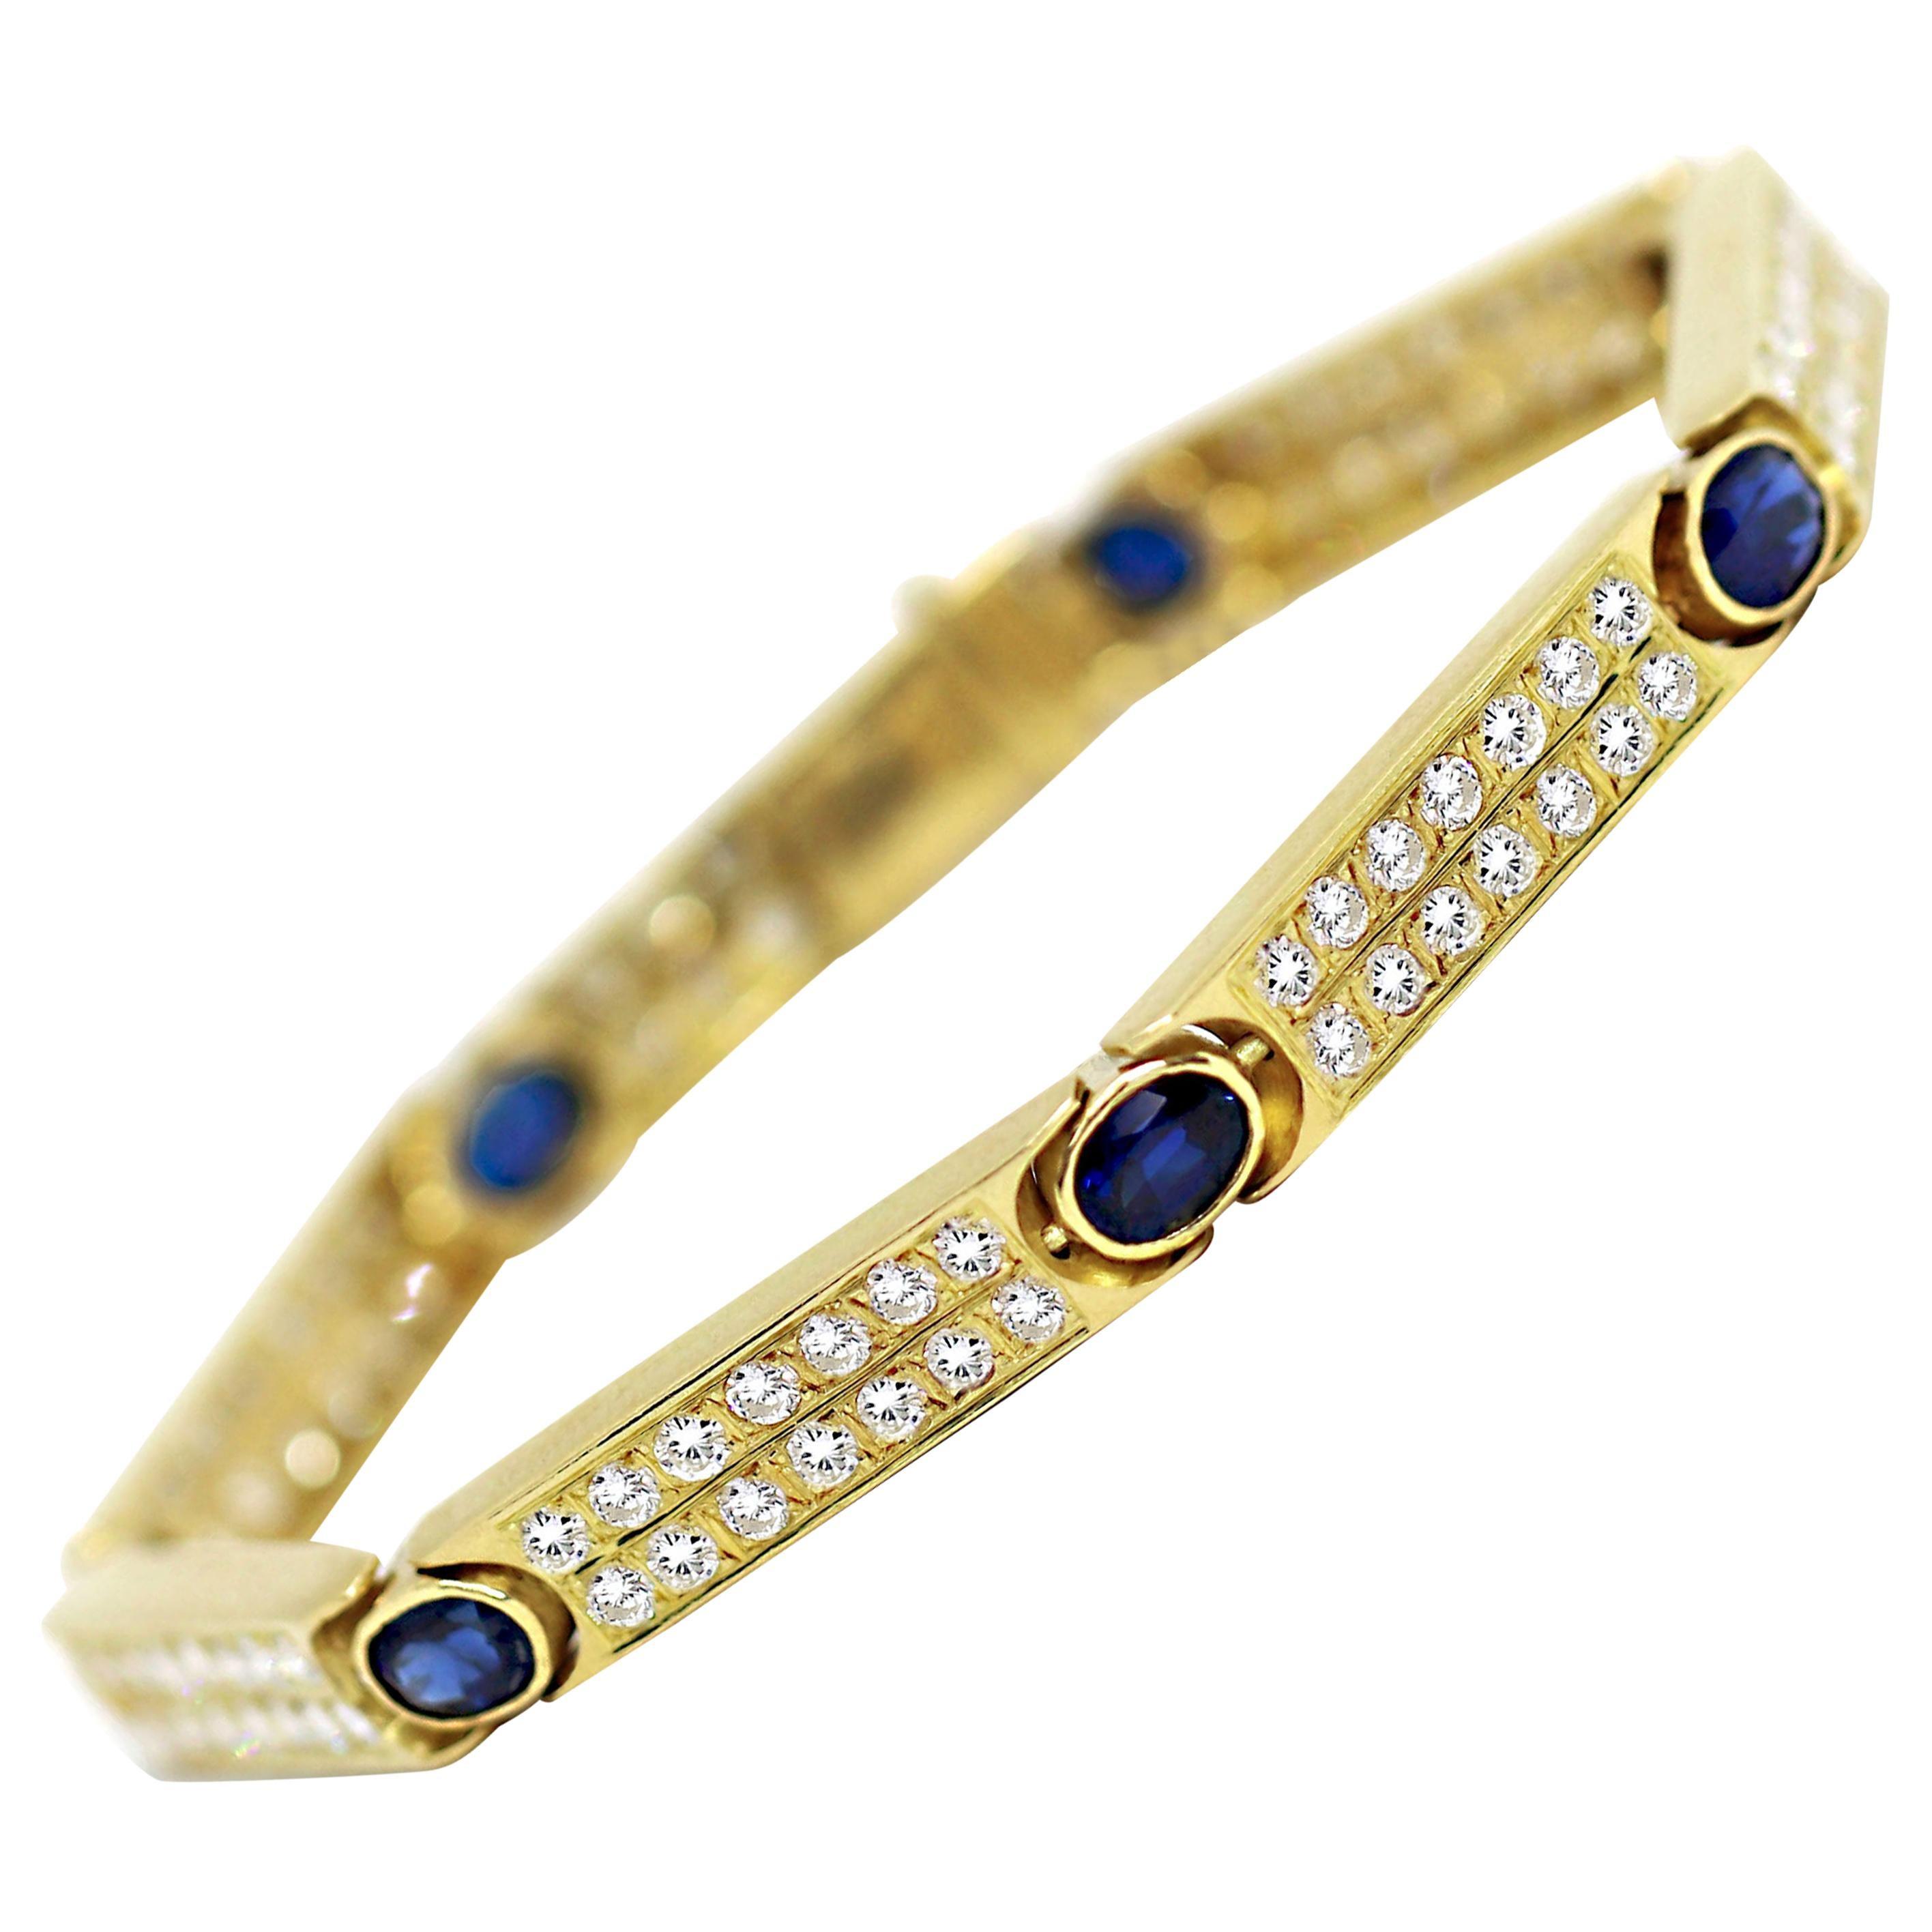 Vintage Sapphire and Diamond 18 Carat Yellow Gold Bracelet